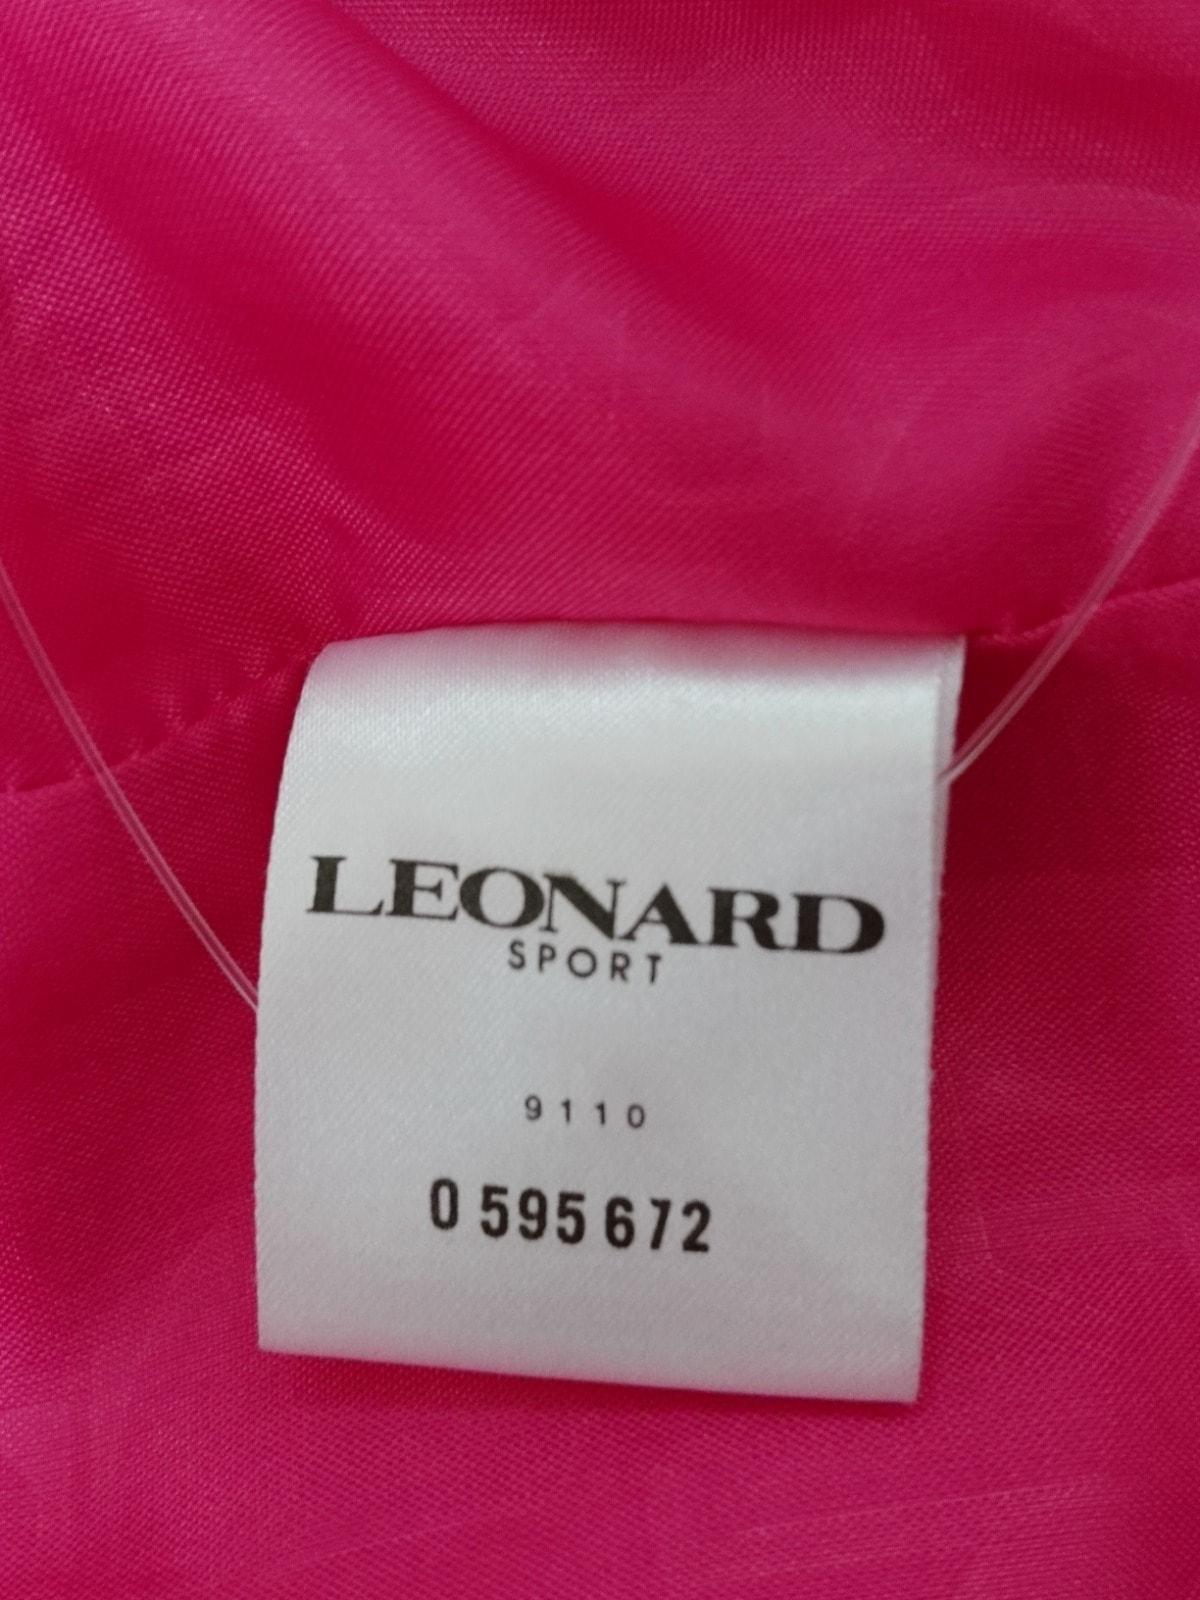 LEONARDO(レオナルド)のブルゾン